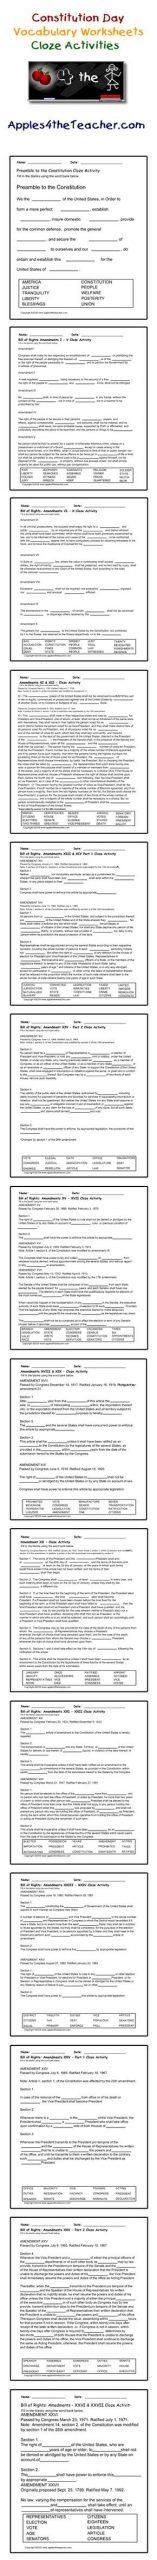 Bill Of Rights Worksheet Cloze Activity Worksheets Bill Of Rights Interactive Cloze